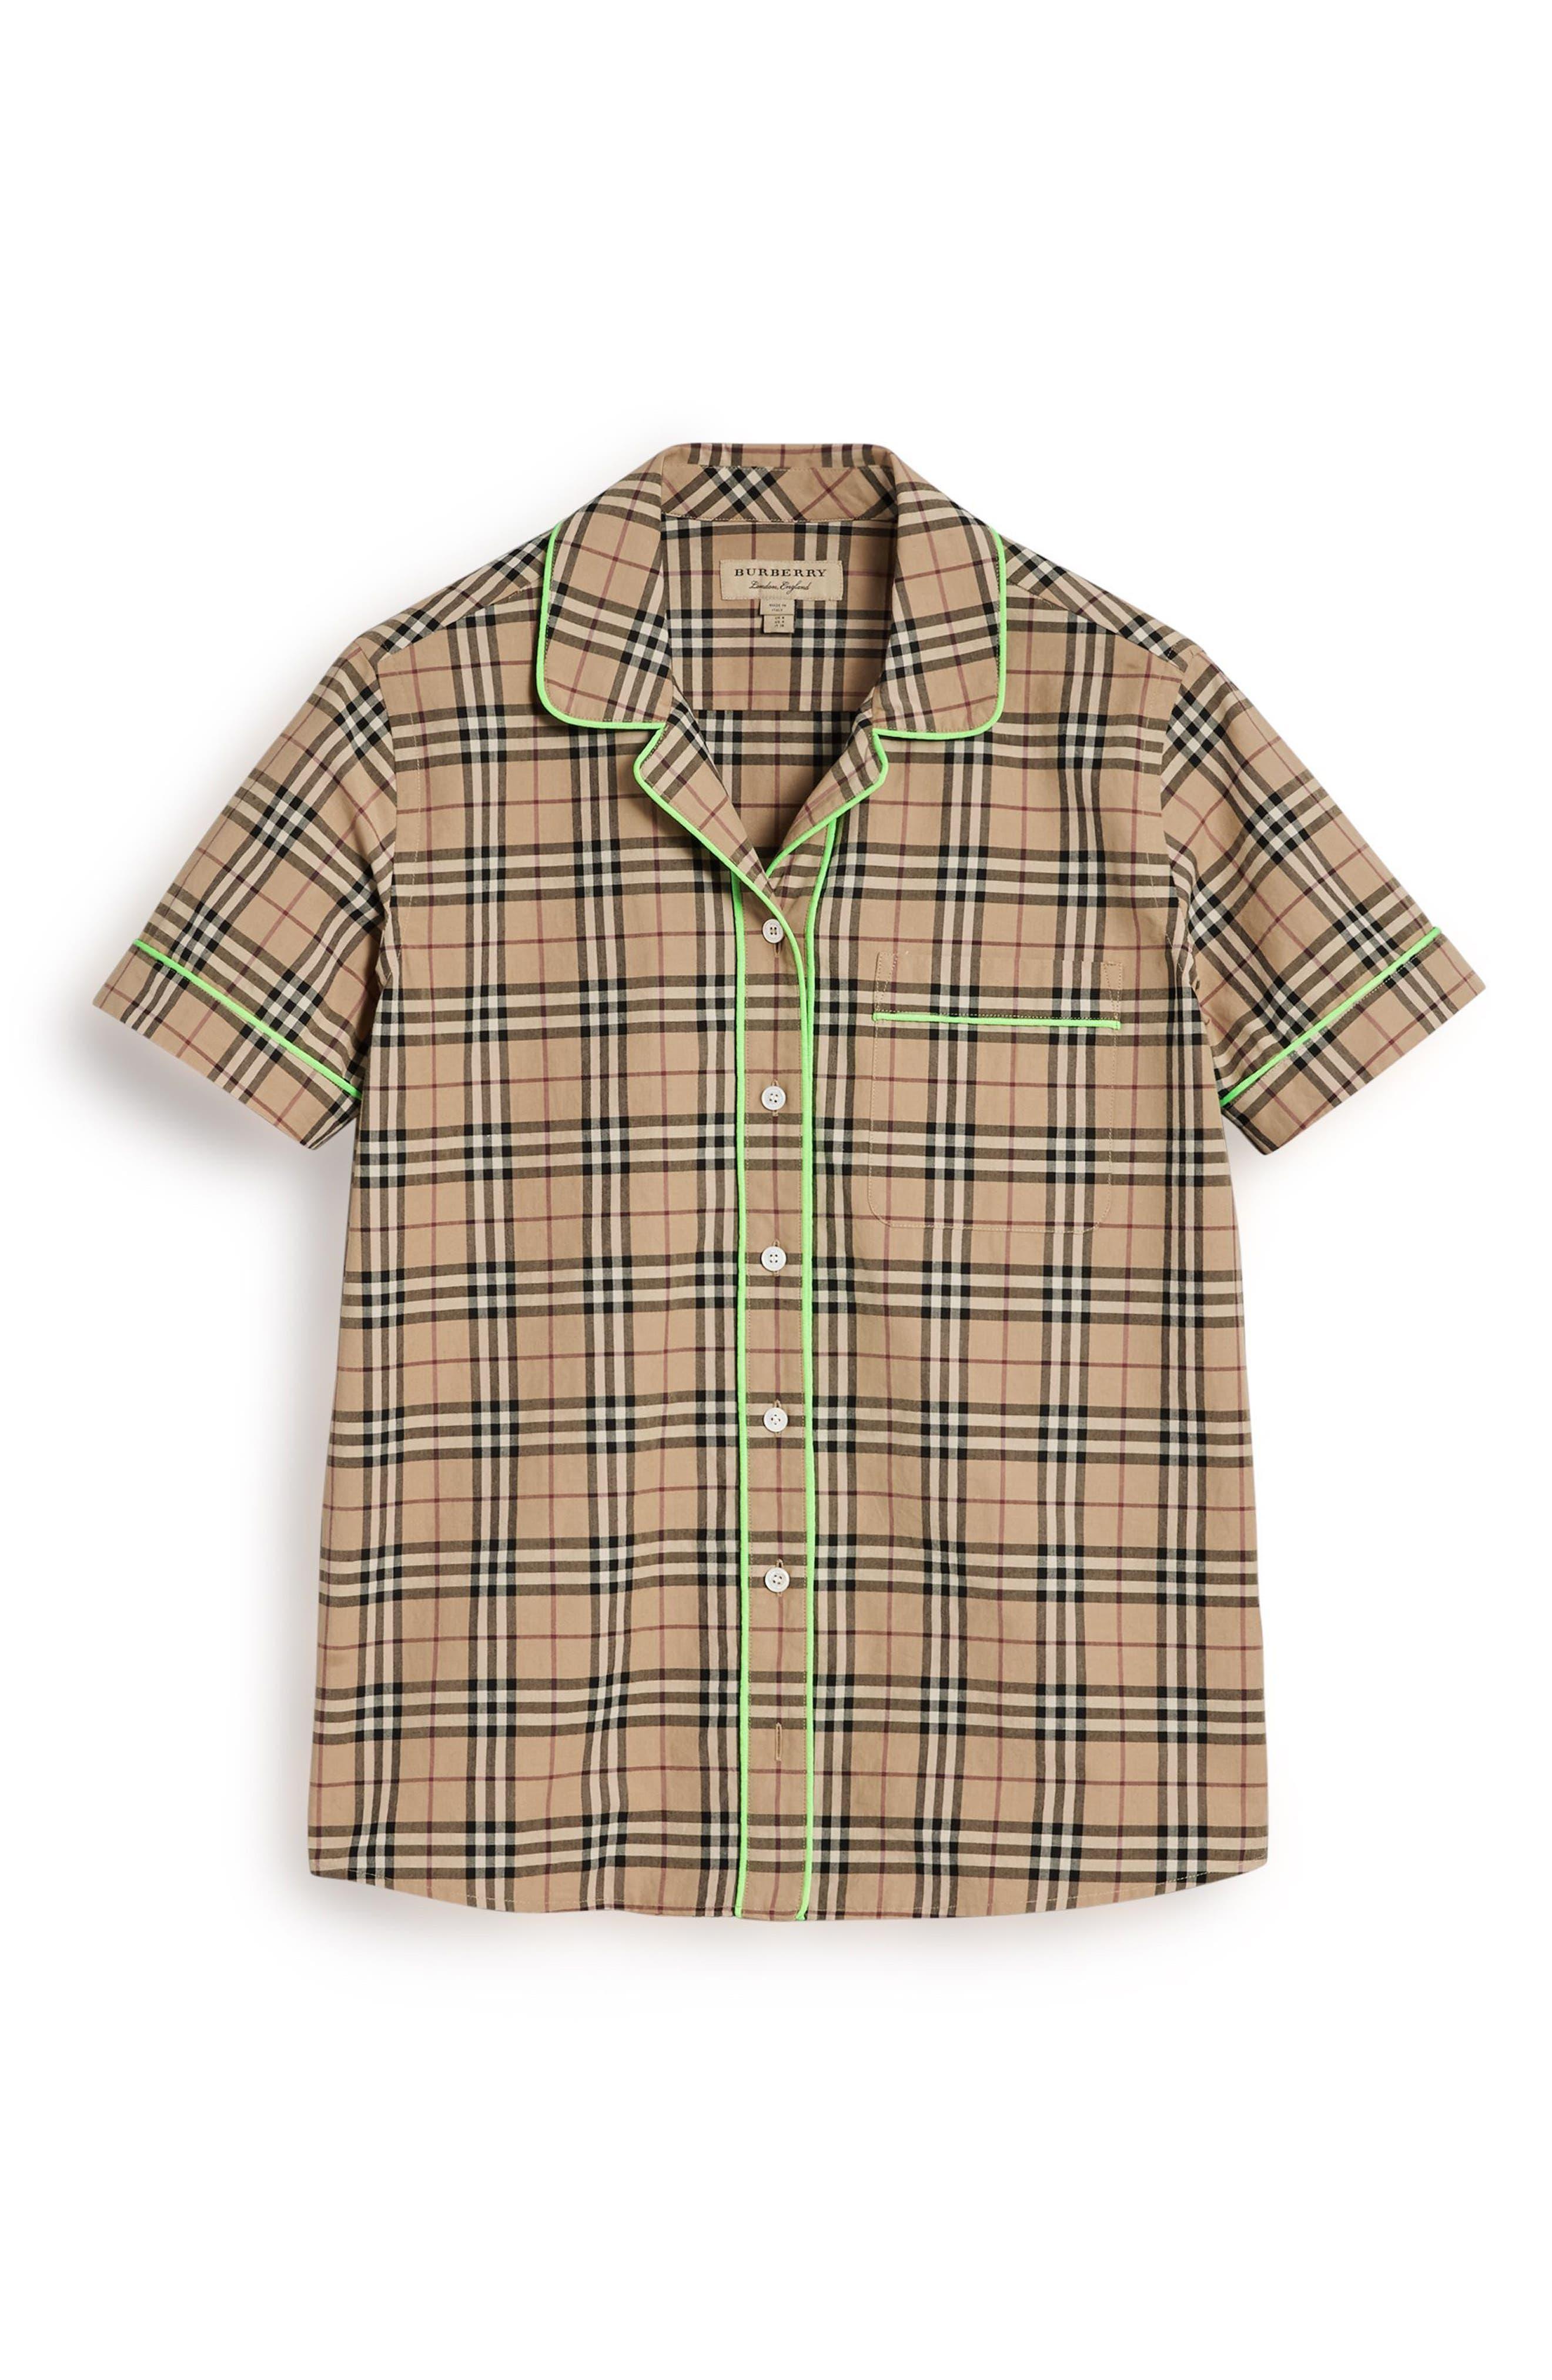 Auklet Check Shirt,                             Alternate thumbnail 4, color,                             231